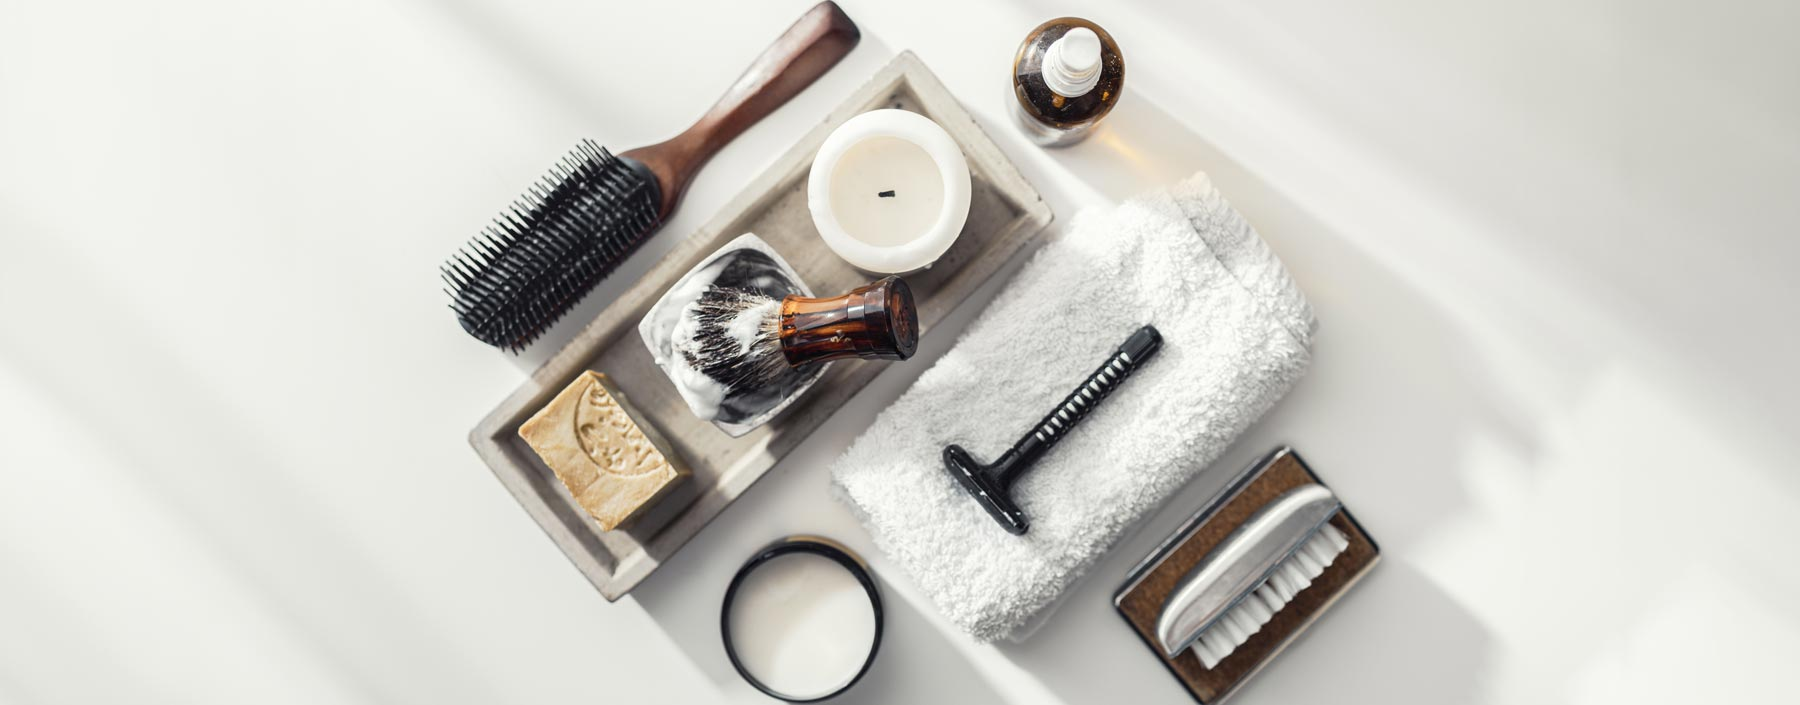 Flat lay of men's grooming tools. Razor, brush, soap, comb.